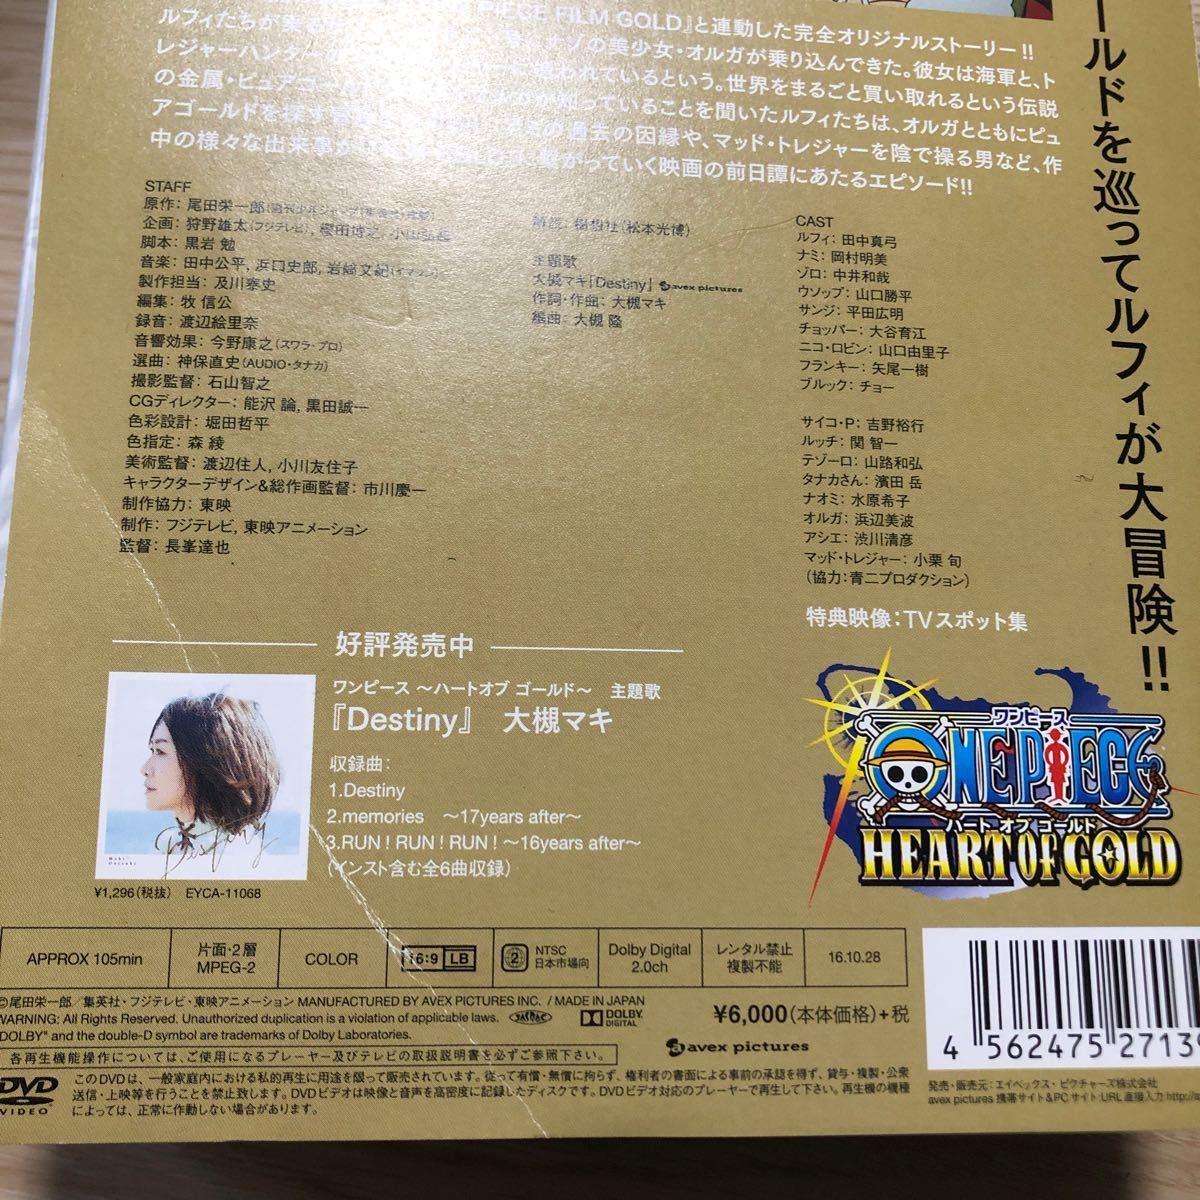 DVD ワンピース 〜ハート オブ ゴールド〜 初回生産限定版 [エイベックス]